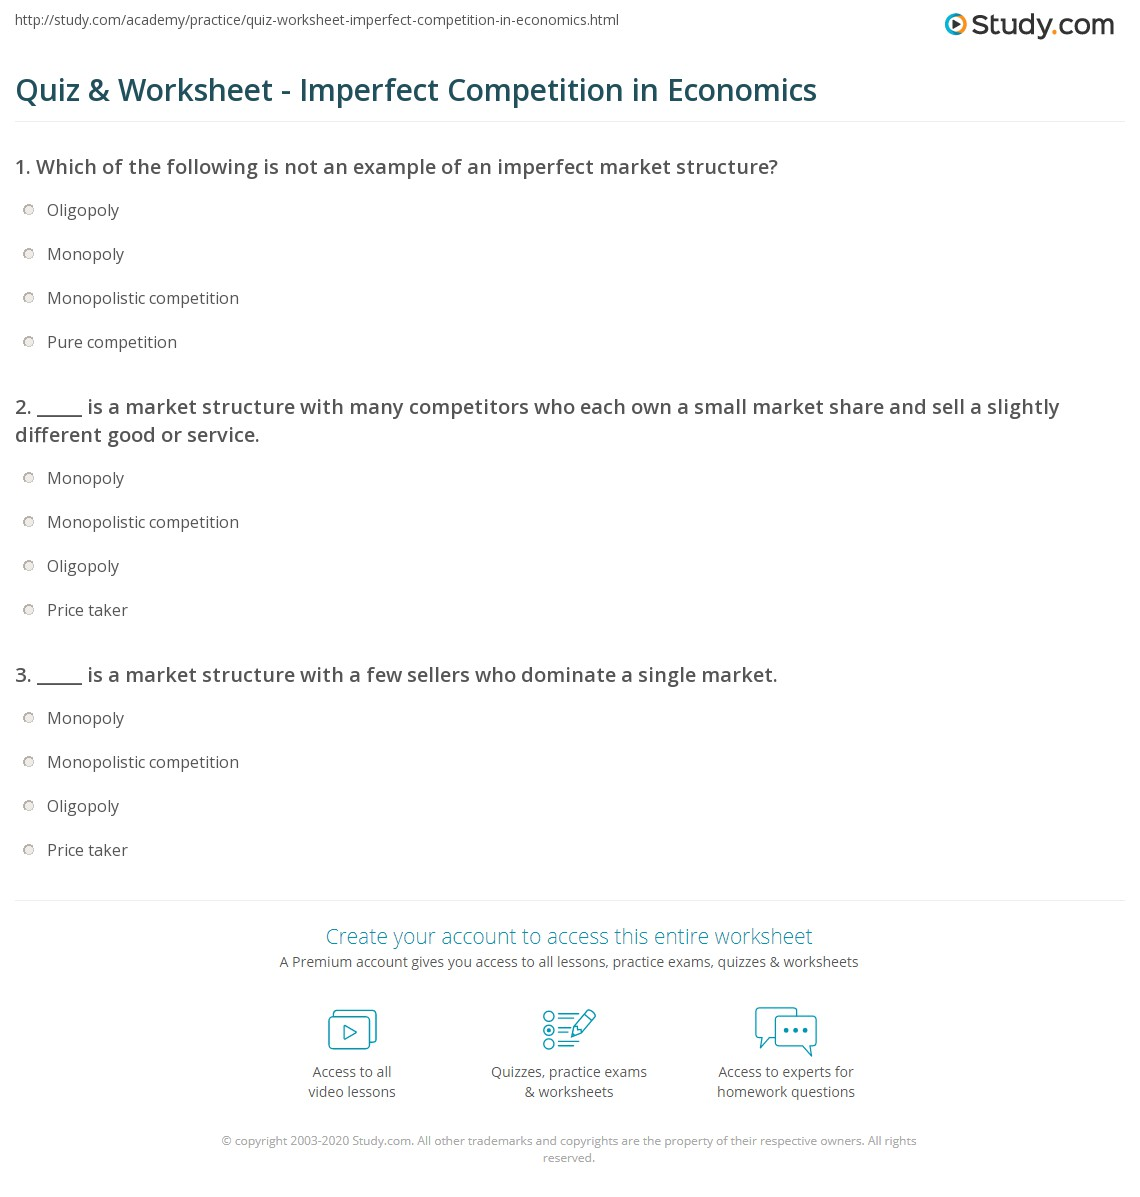 Quiz & Worksheet - Imperfect Competition in Economics | Study.com